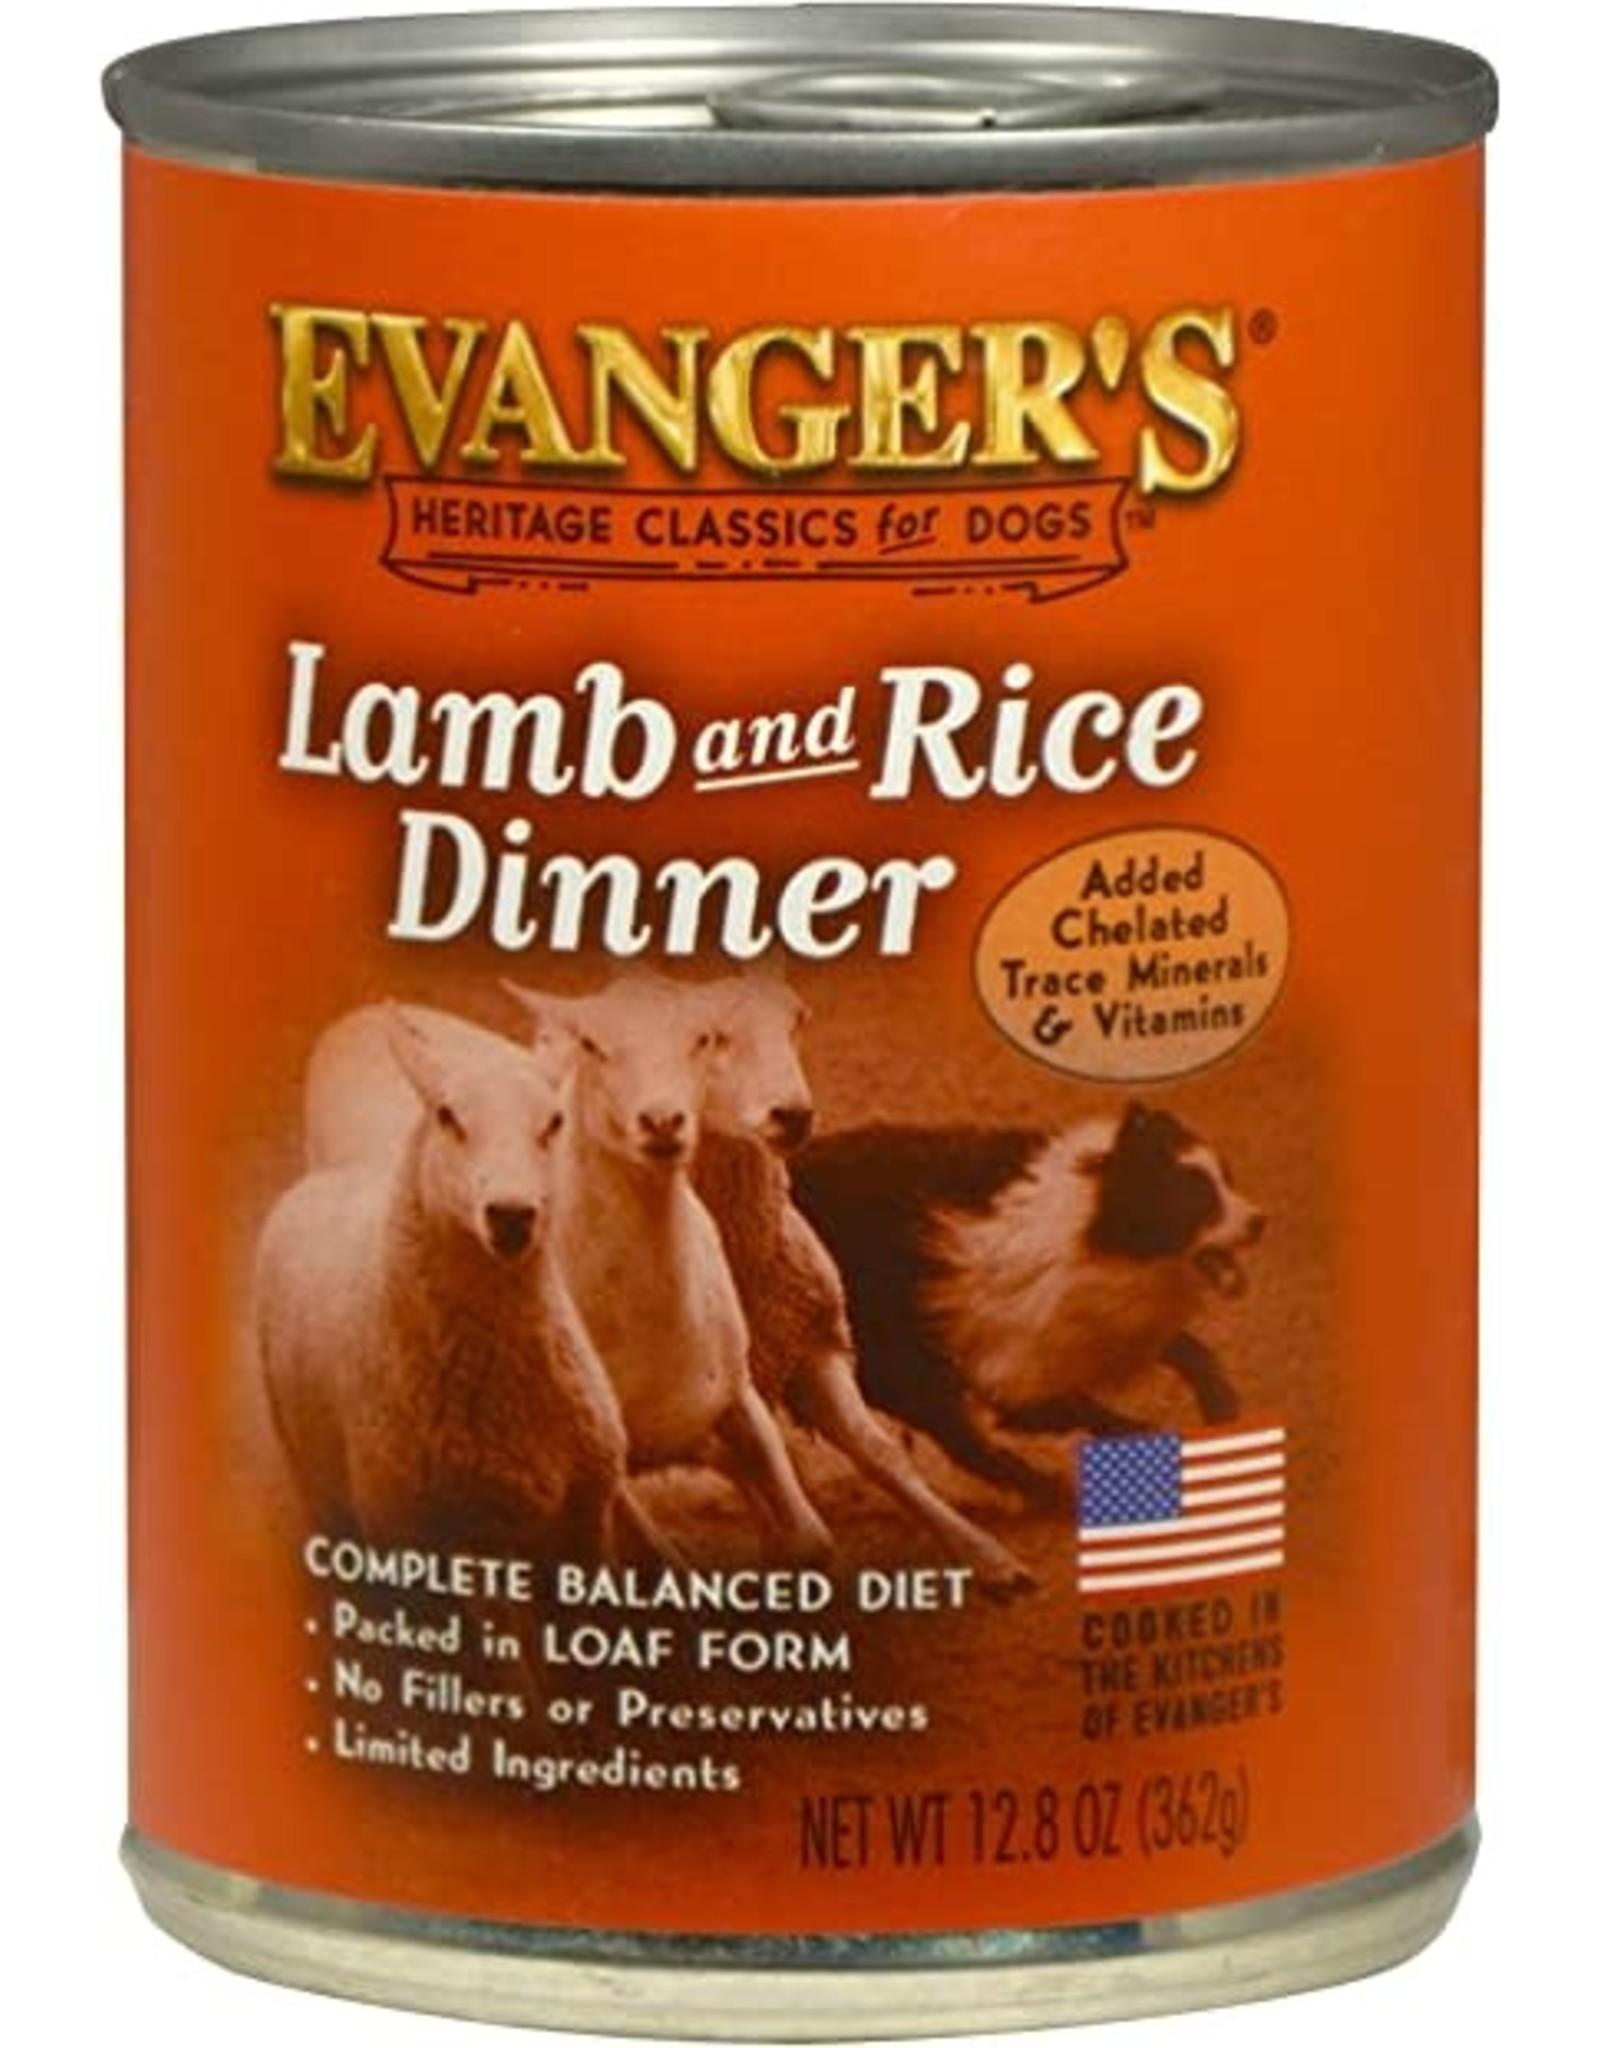 Evangers Evanger's Classic Lamb & Rice Dog Food 12.8oz